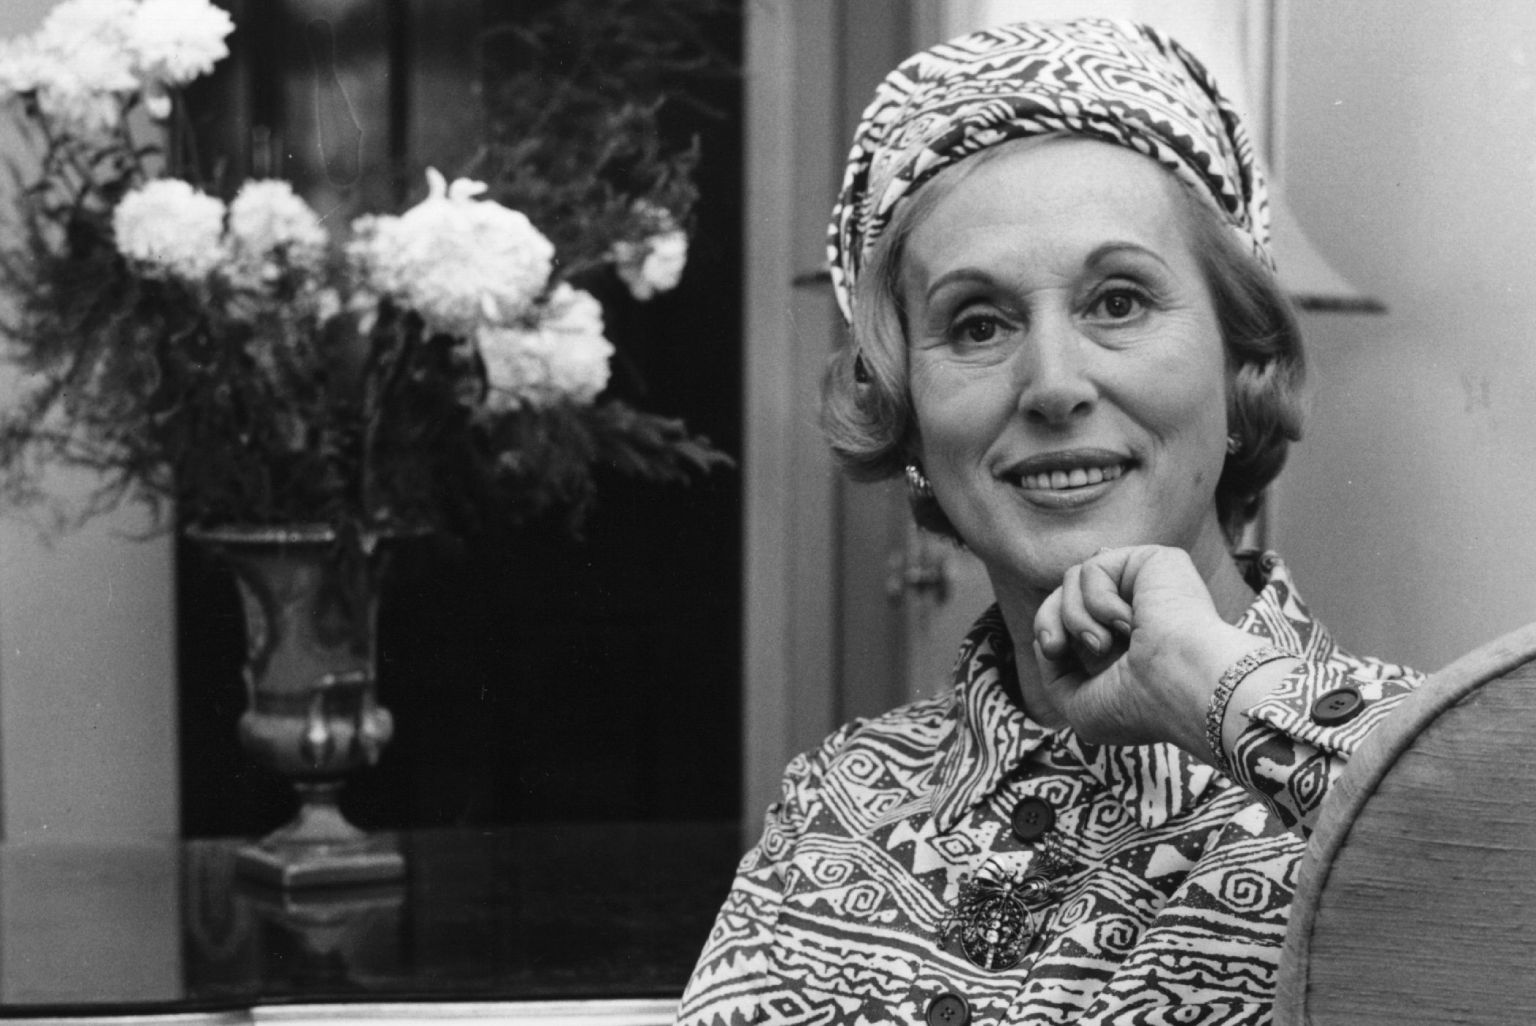 1906-2004 Jüdin Estée Lauder. Amerikanische Kosmetik-Unternehmerin.